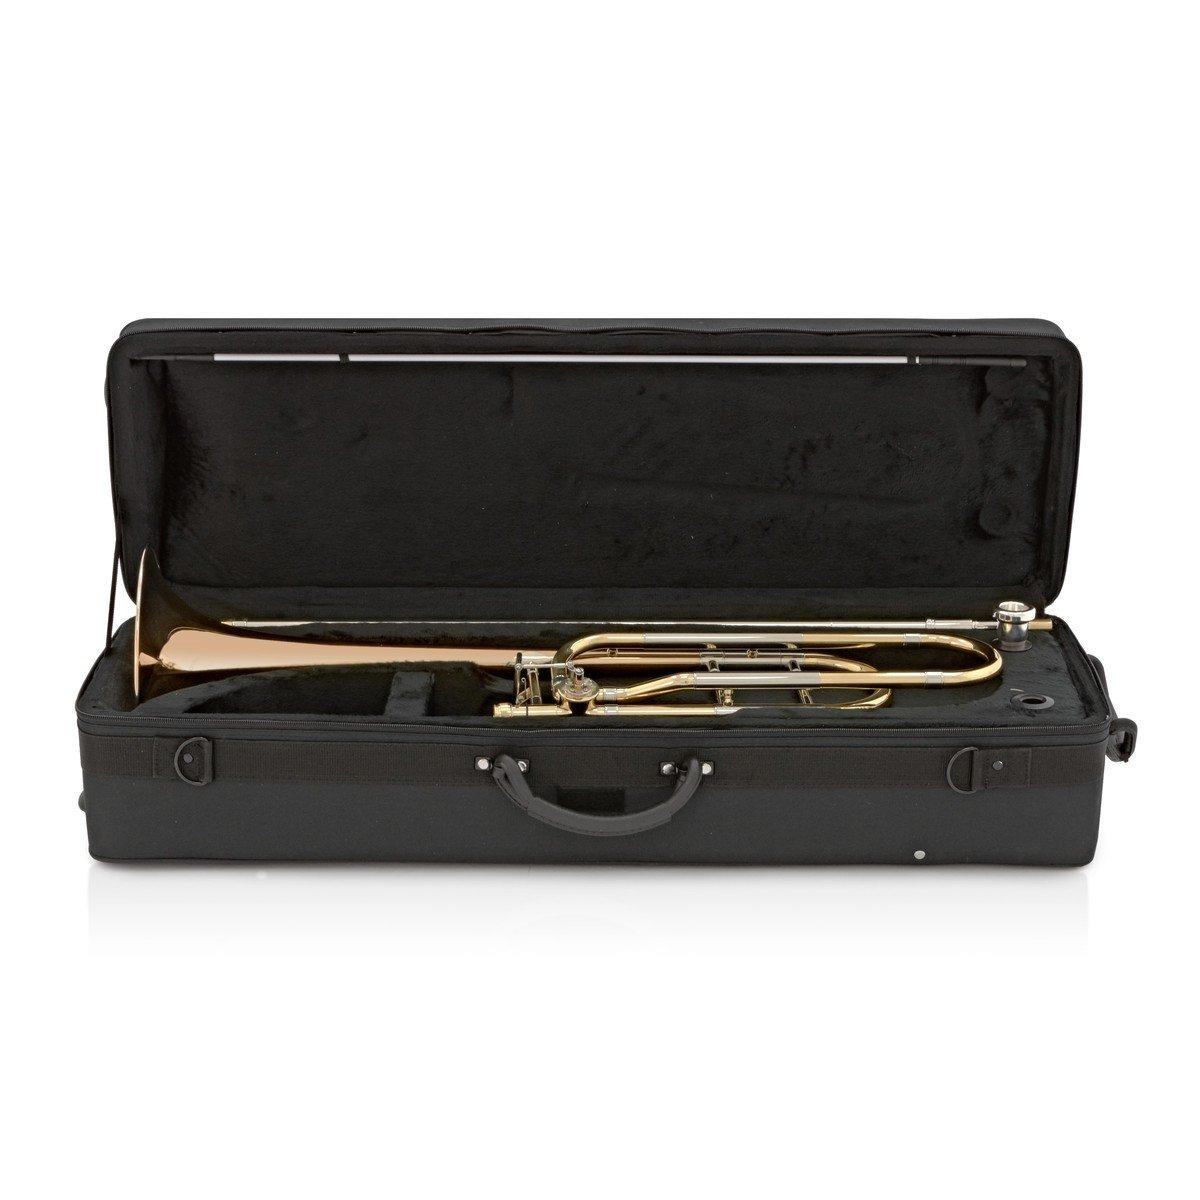 Trombone Professionnel Si B/émol//Fa Coppergate par Gear4music